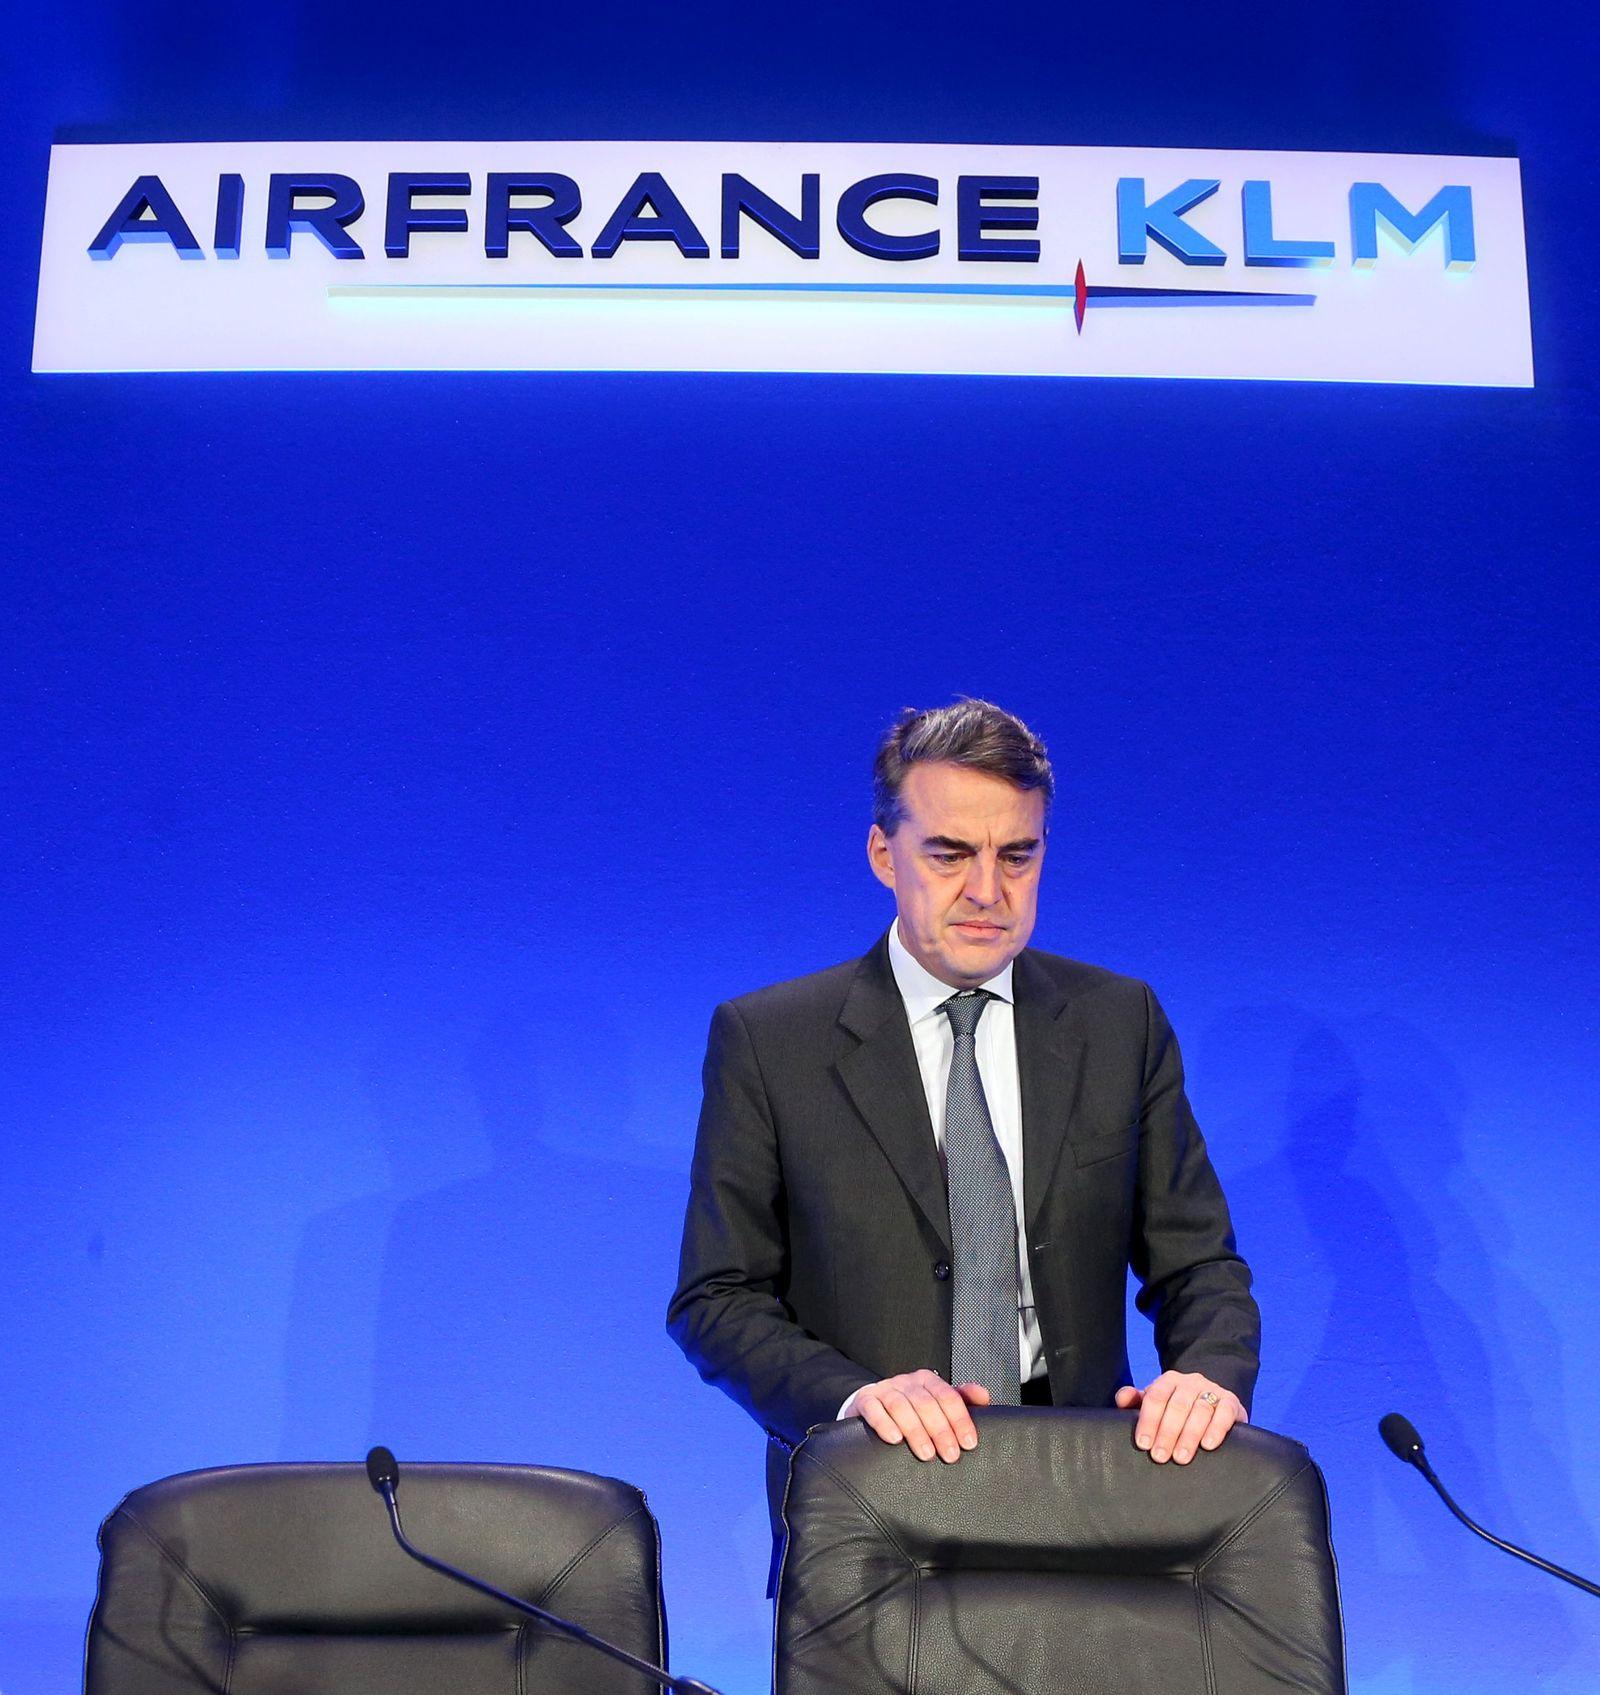 Alexandre de Juniac, Air France